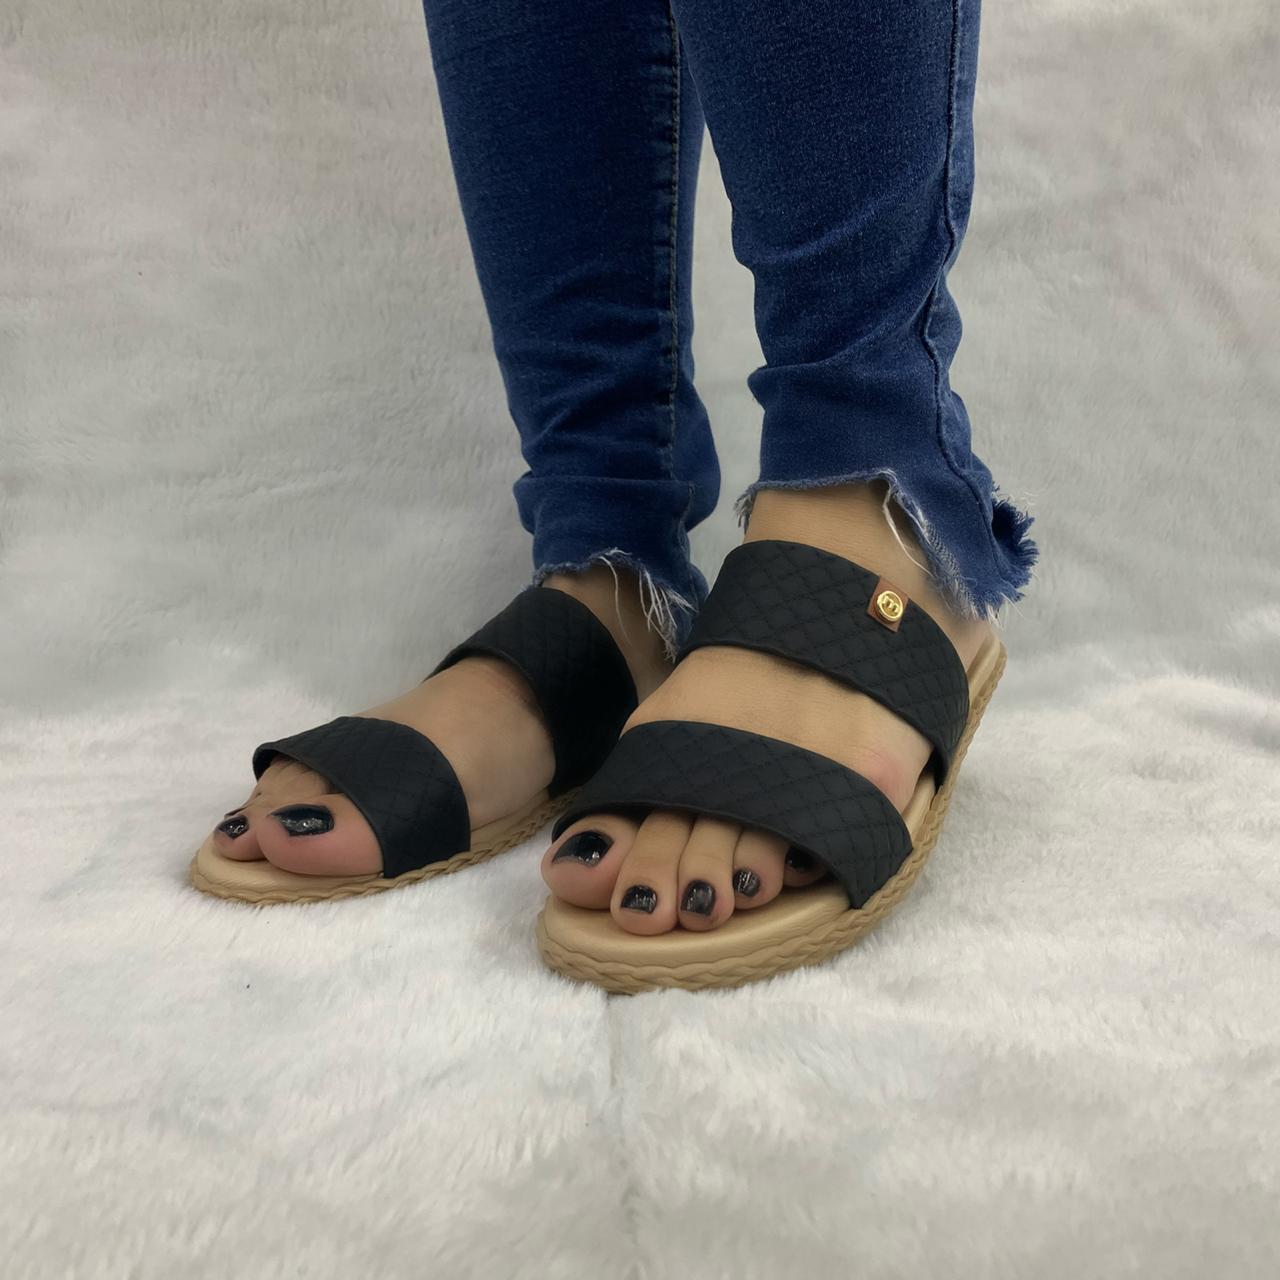 Sandália Chinelo Moleca Rasteira Conforto 5452.100 Feminina